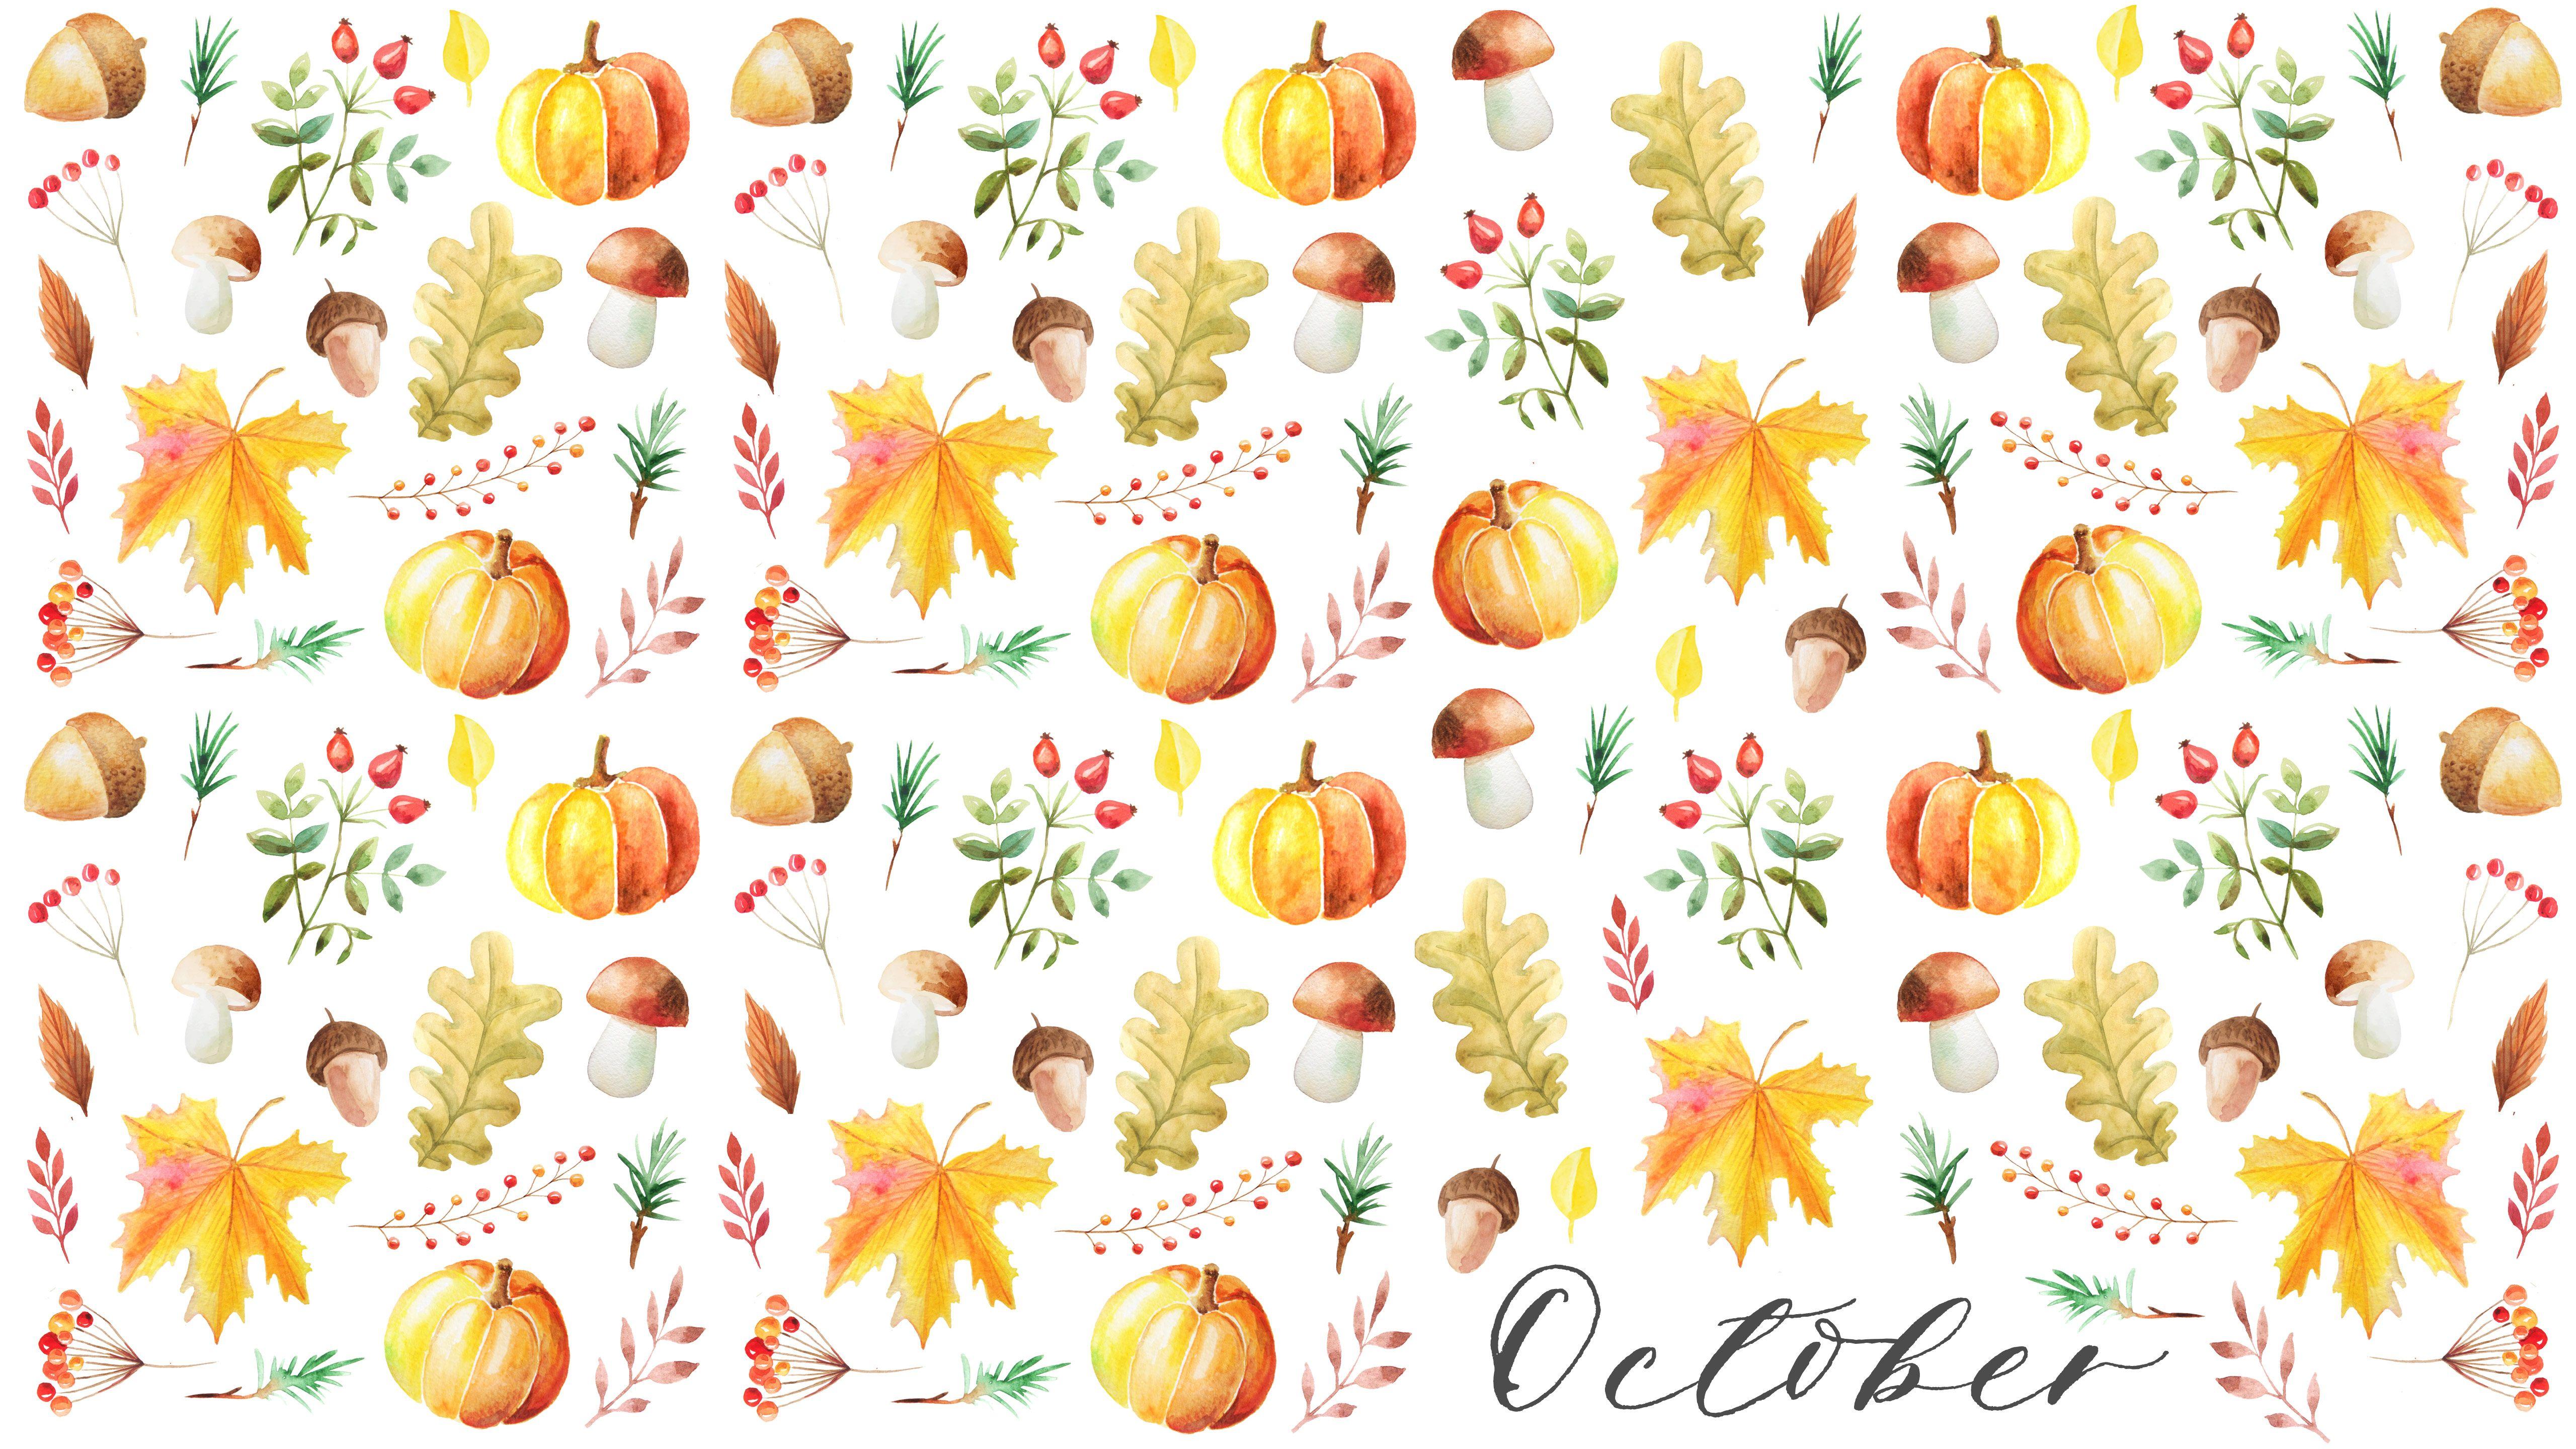 Autumn Watercolor Wallpaper Desktop Osbp Jpg 5 120 2 880 Pixels Fall Watercolor Watercolor Wallpaper Desktop Wallpaper